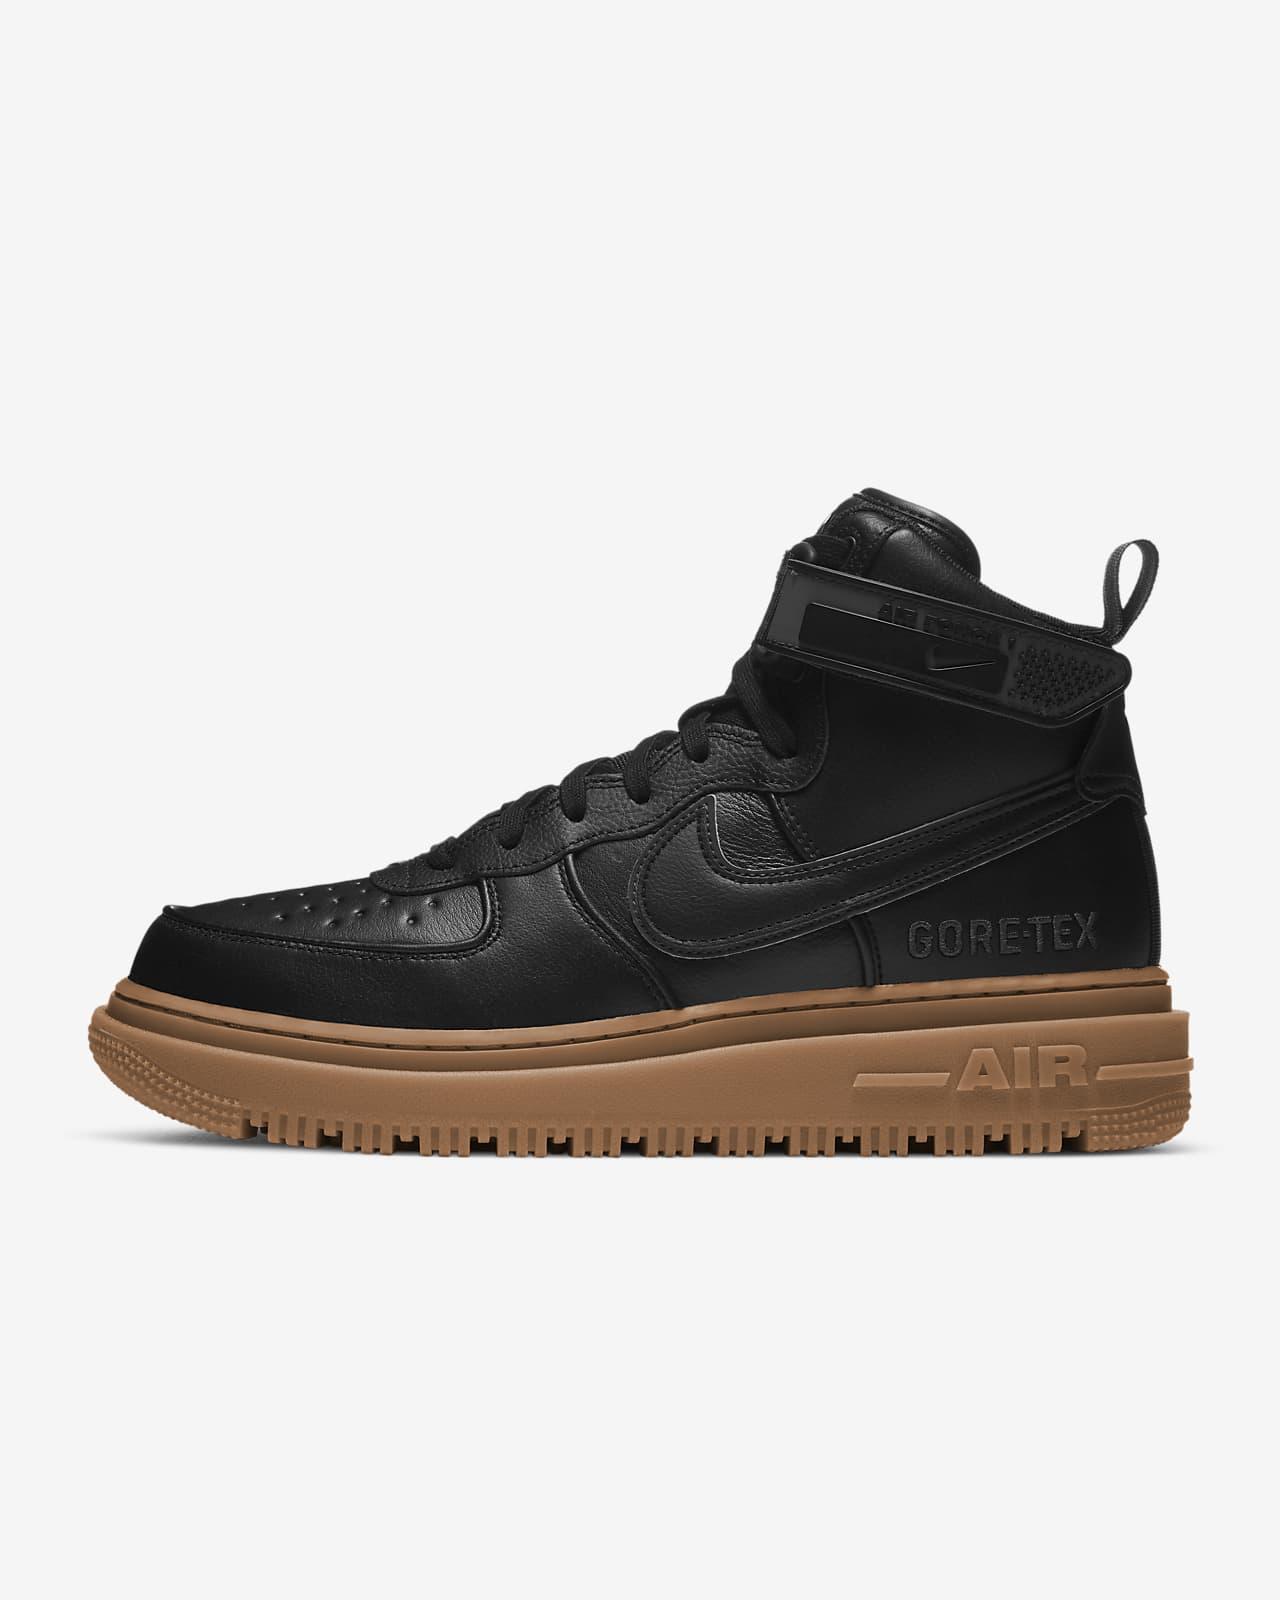 Nike Air Force 1 GTX Boot Boot